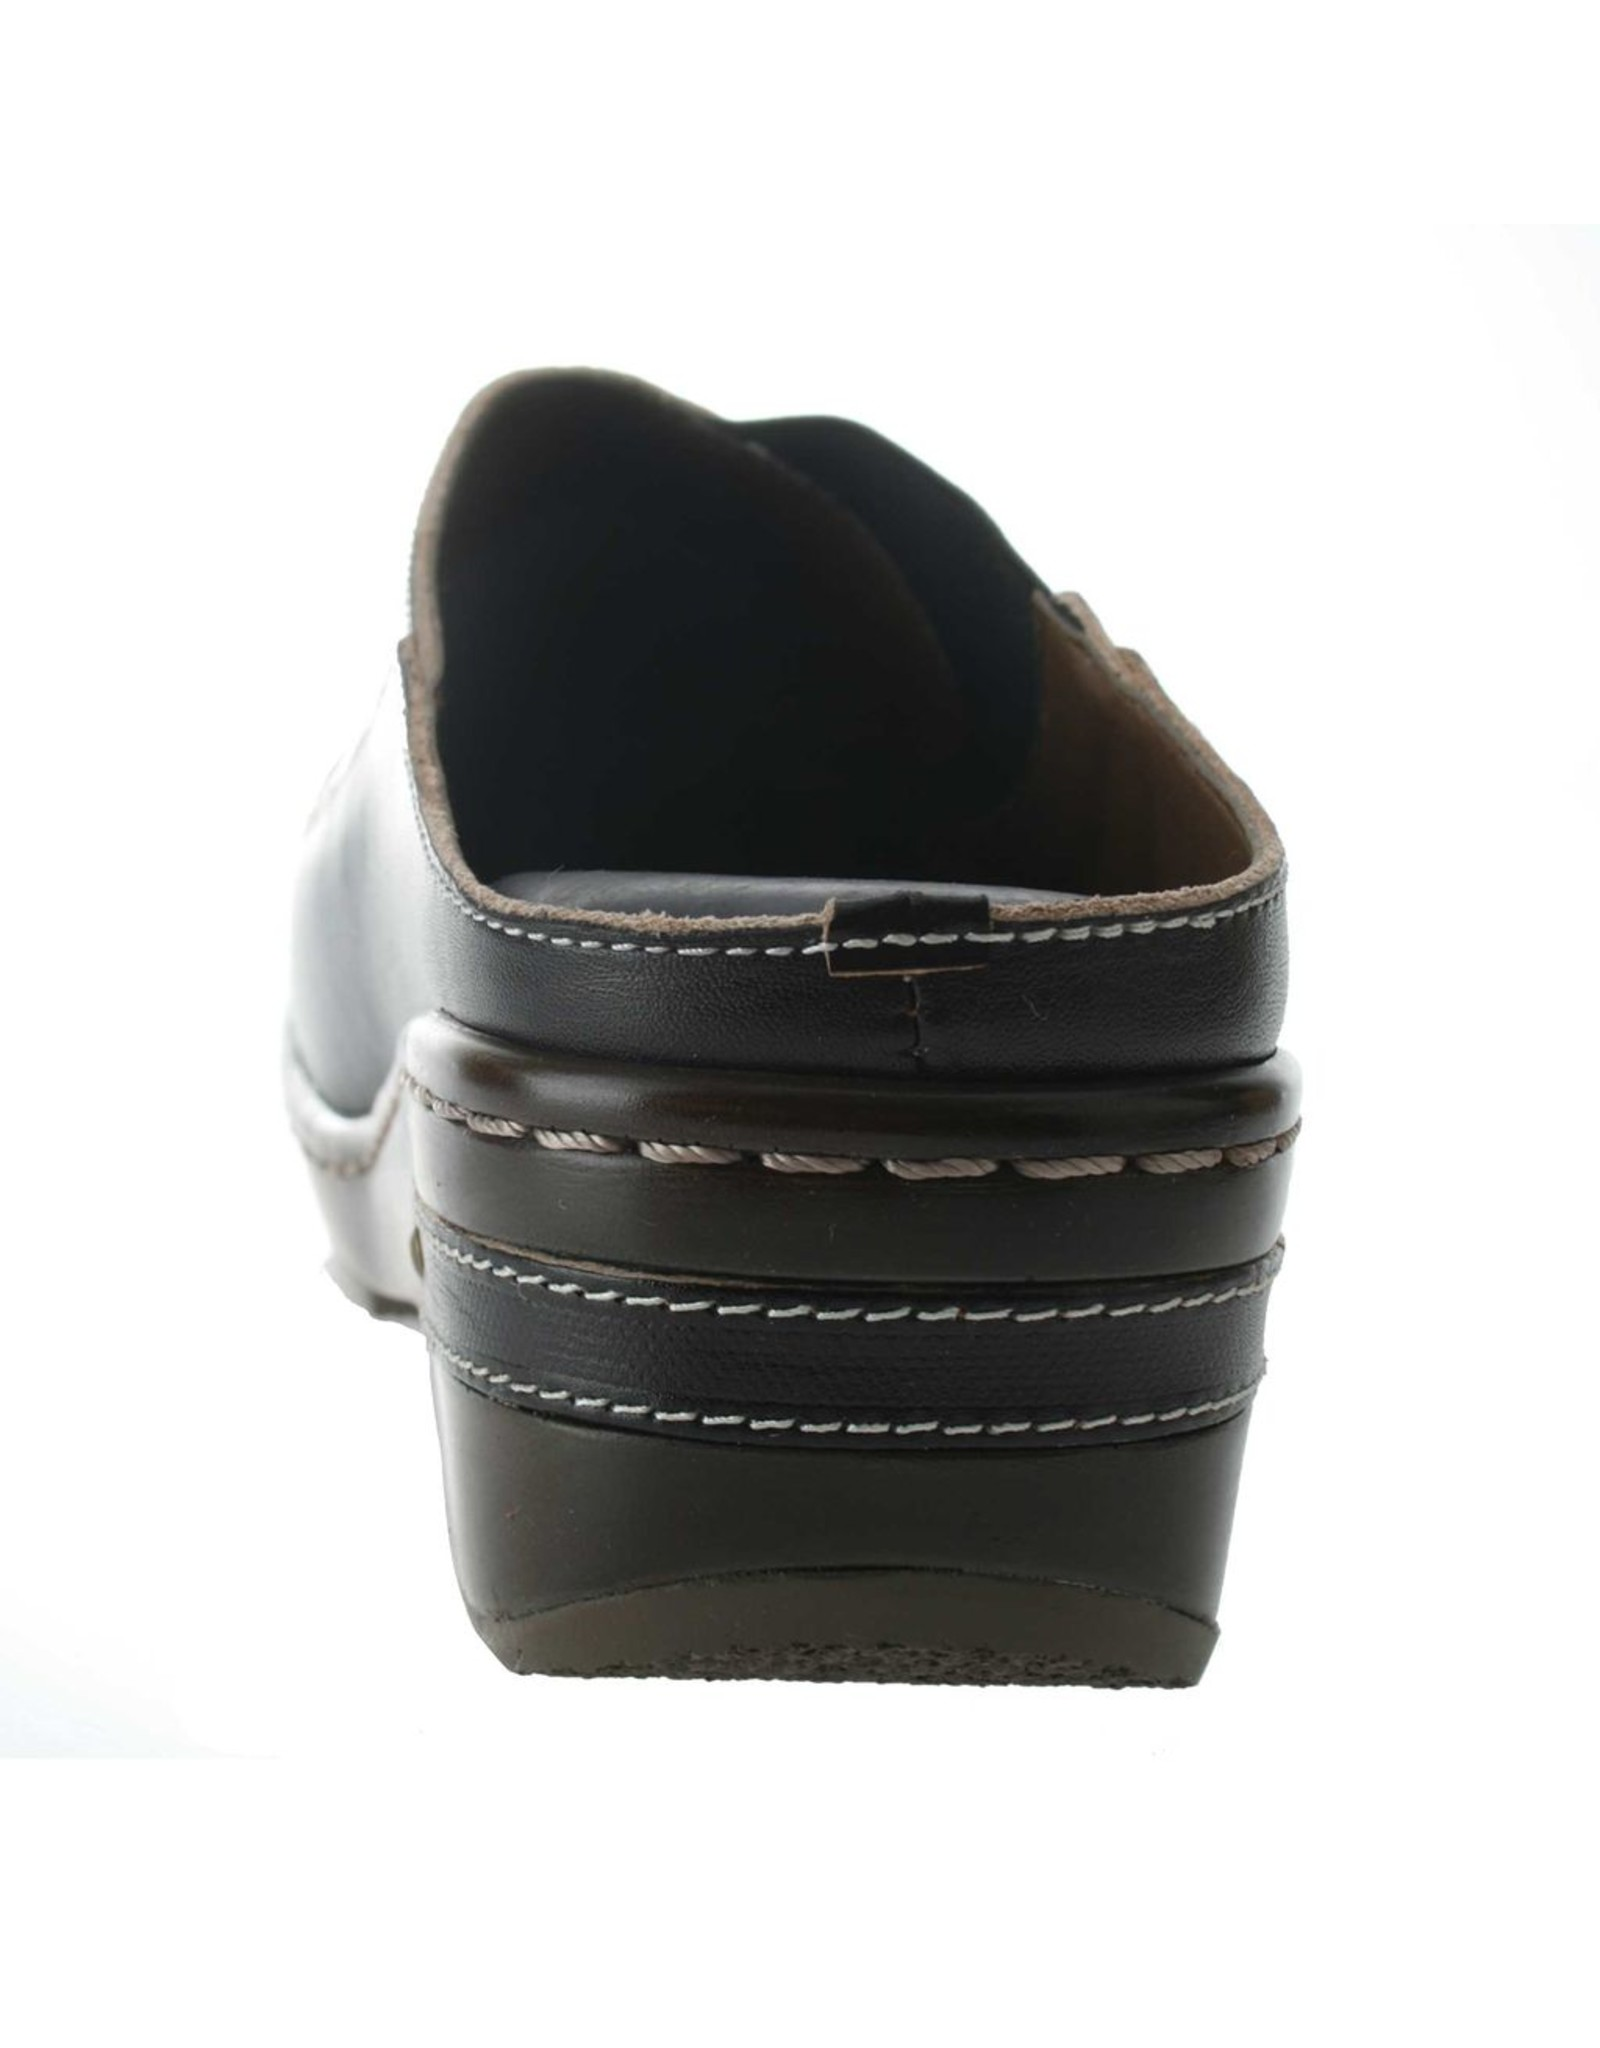 Chino Black Leather Clog